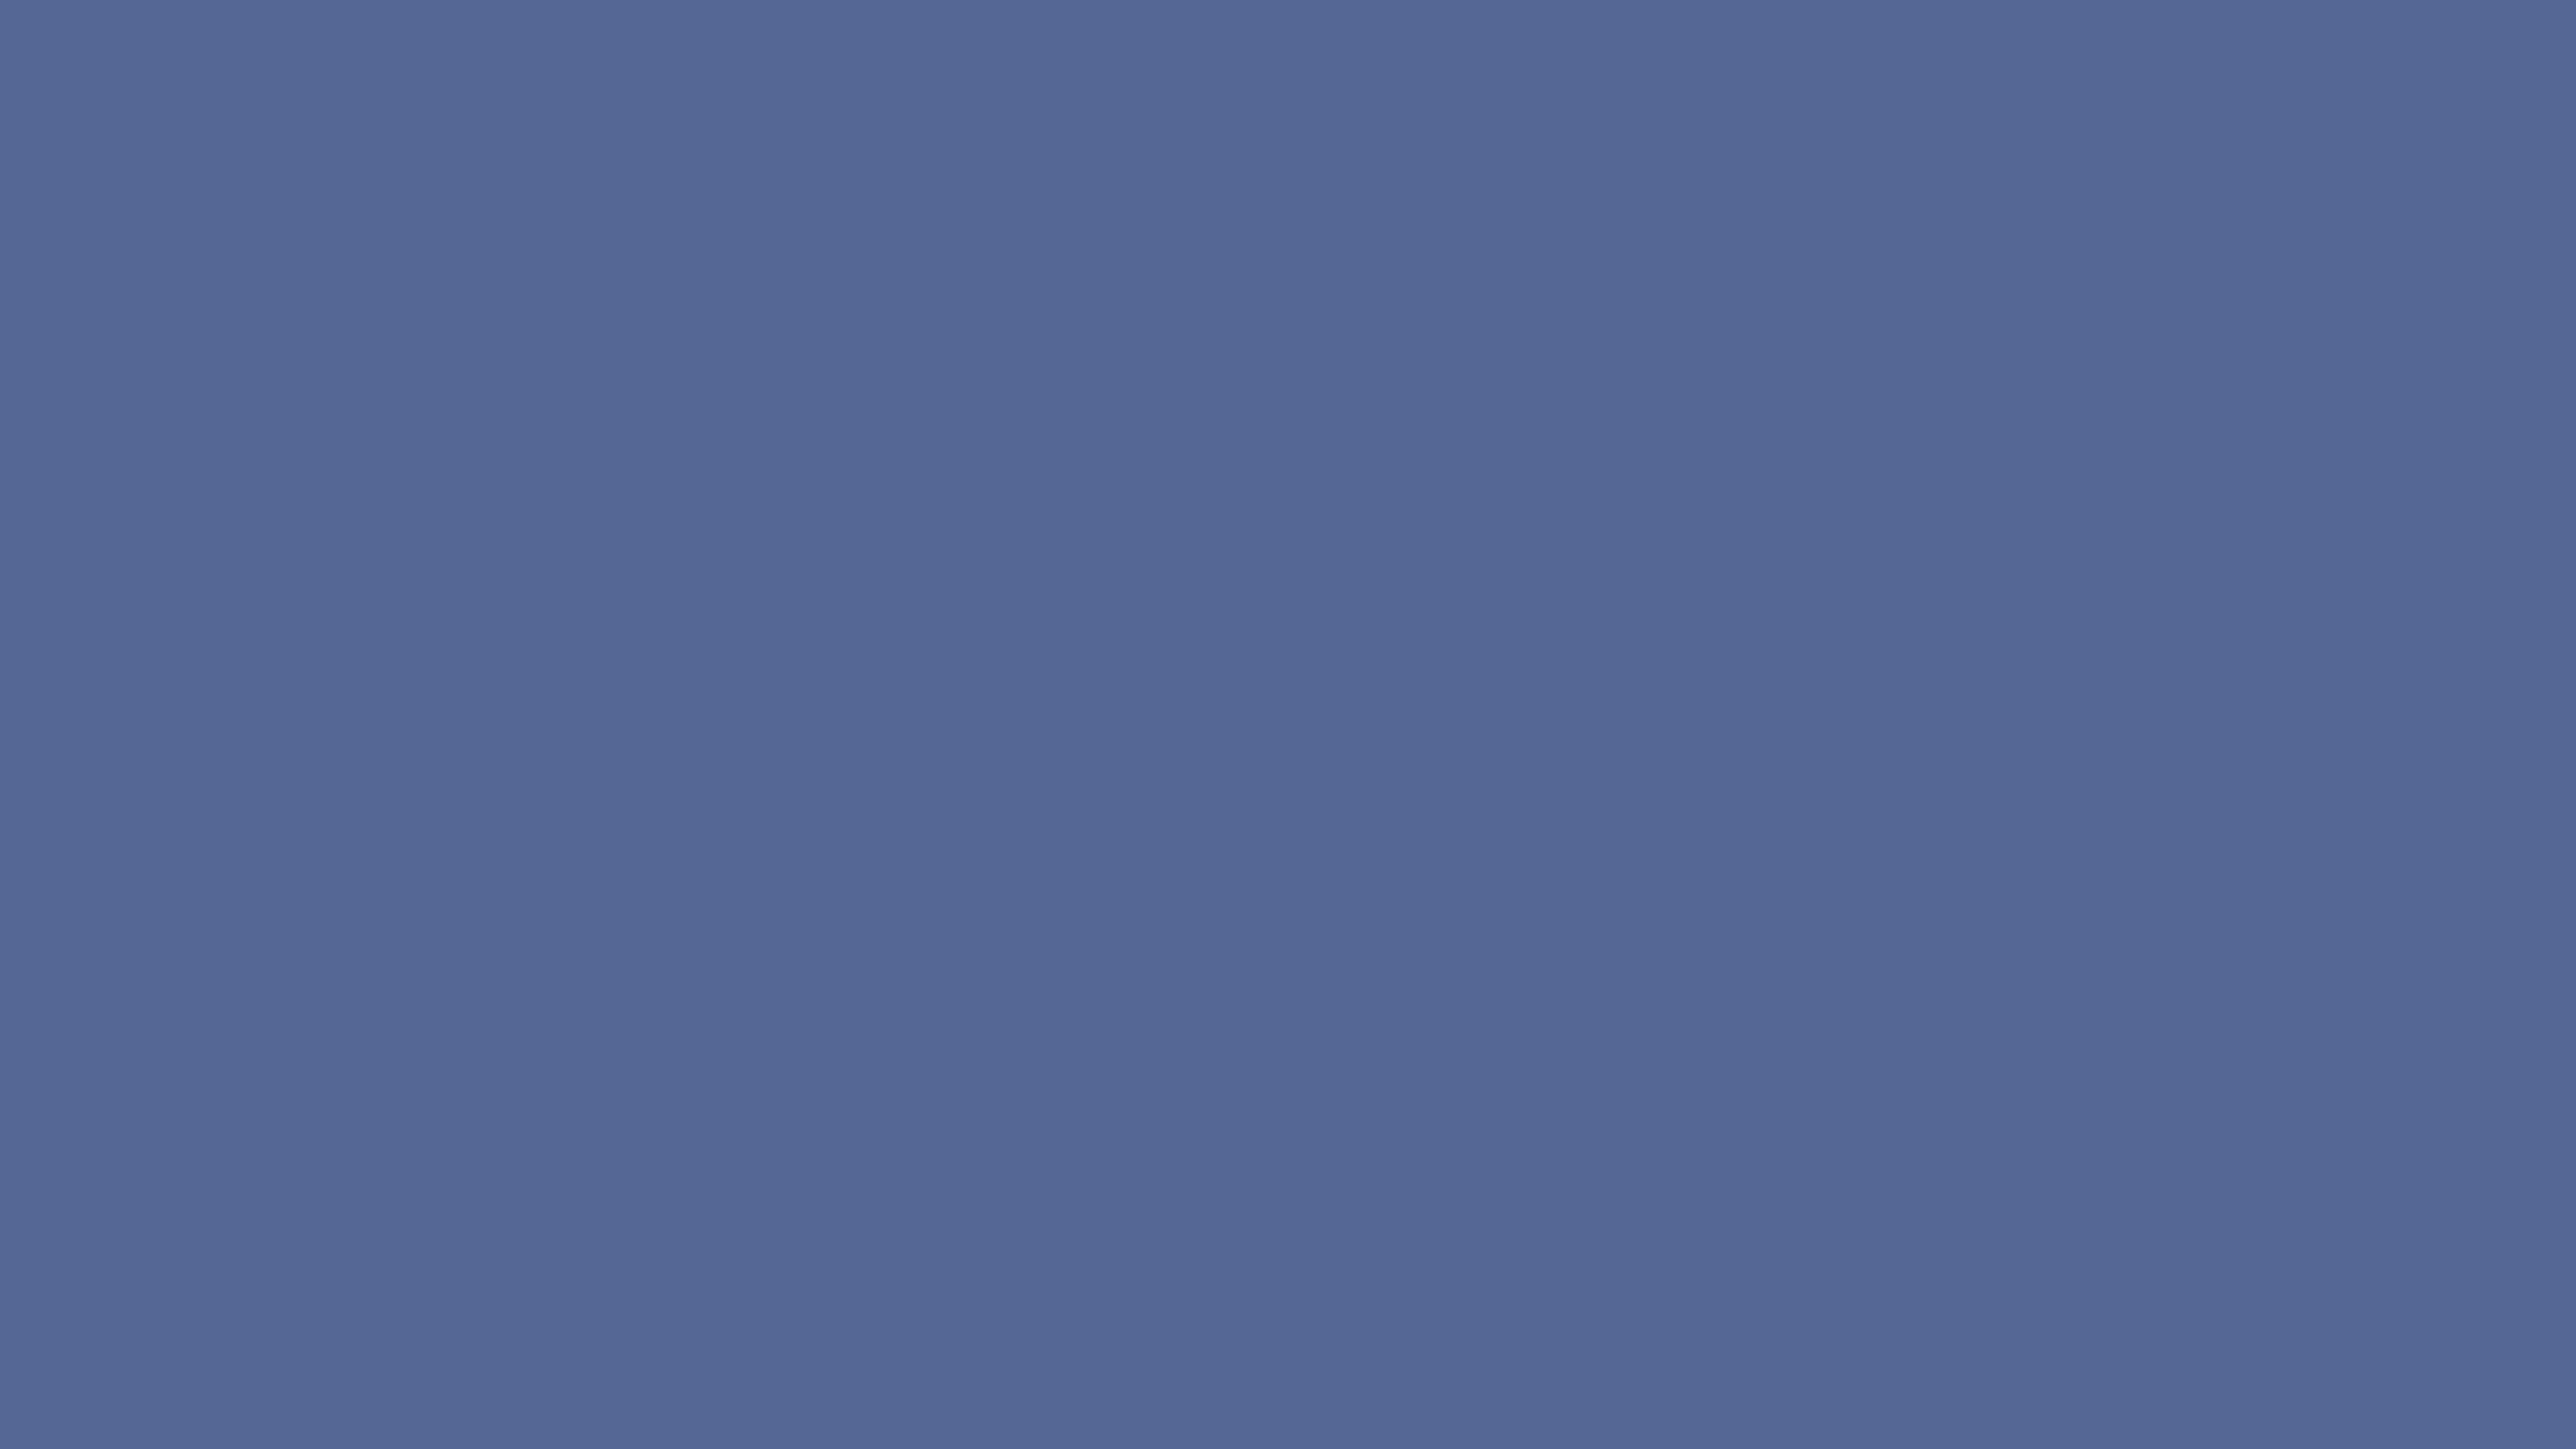 5120x2880 UCLA Blue Solid Color Background